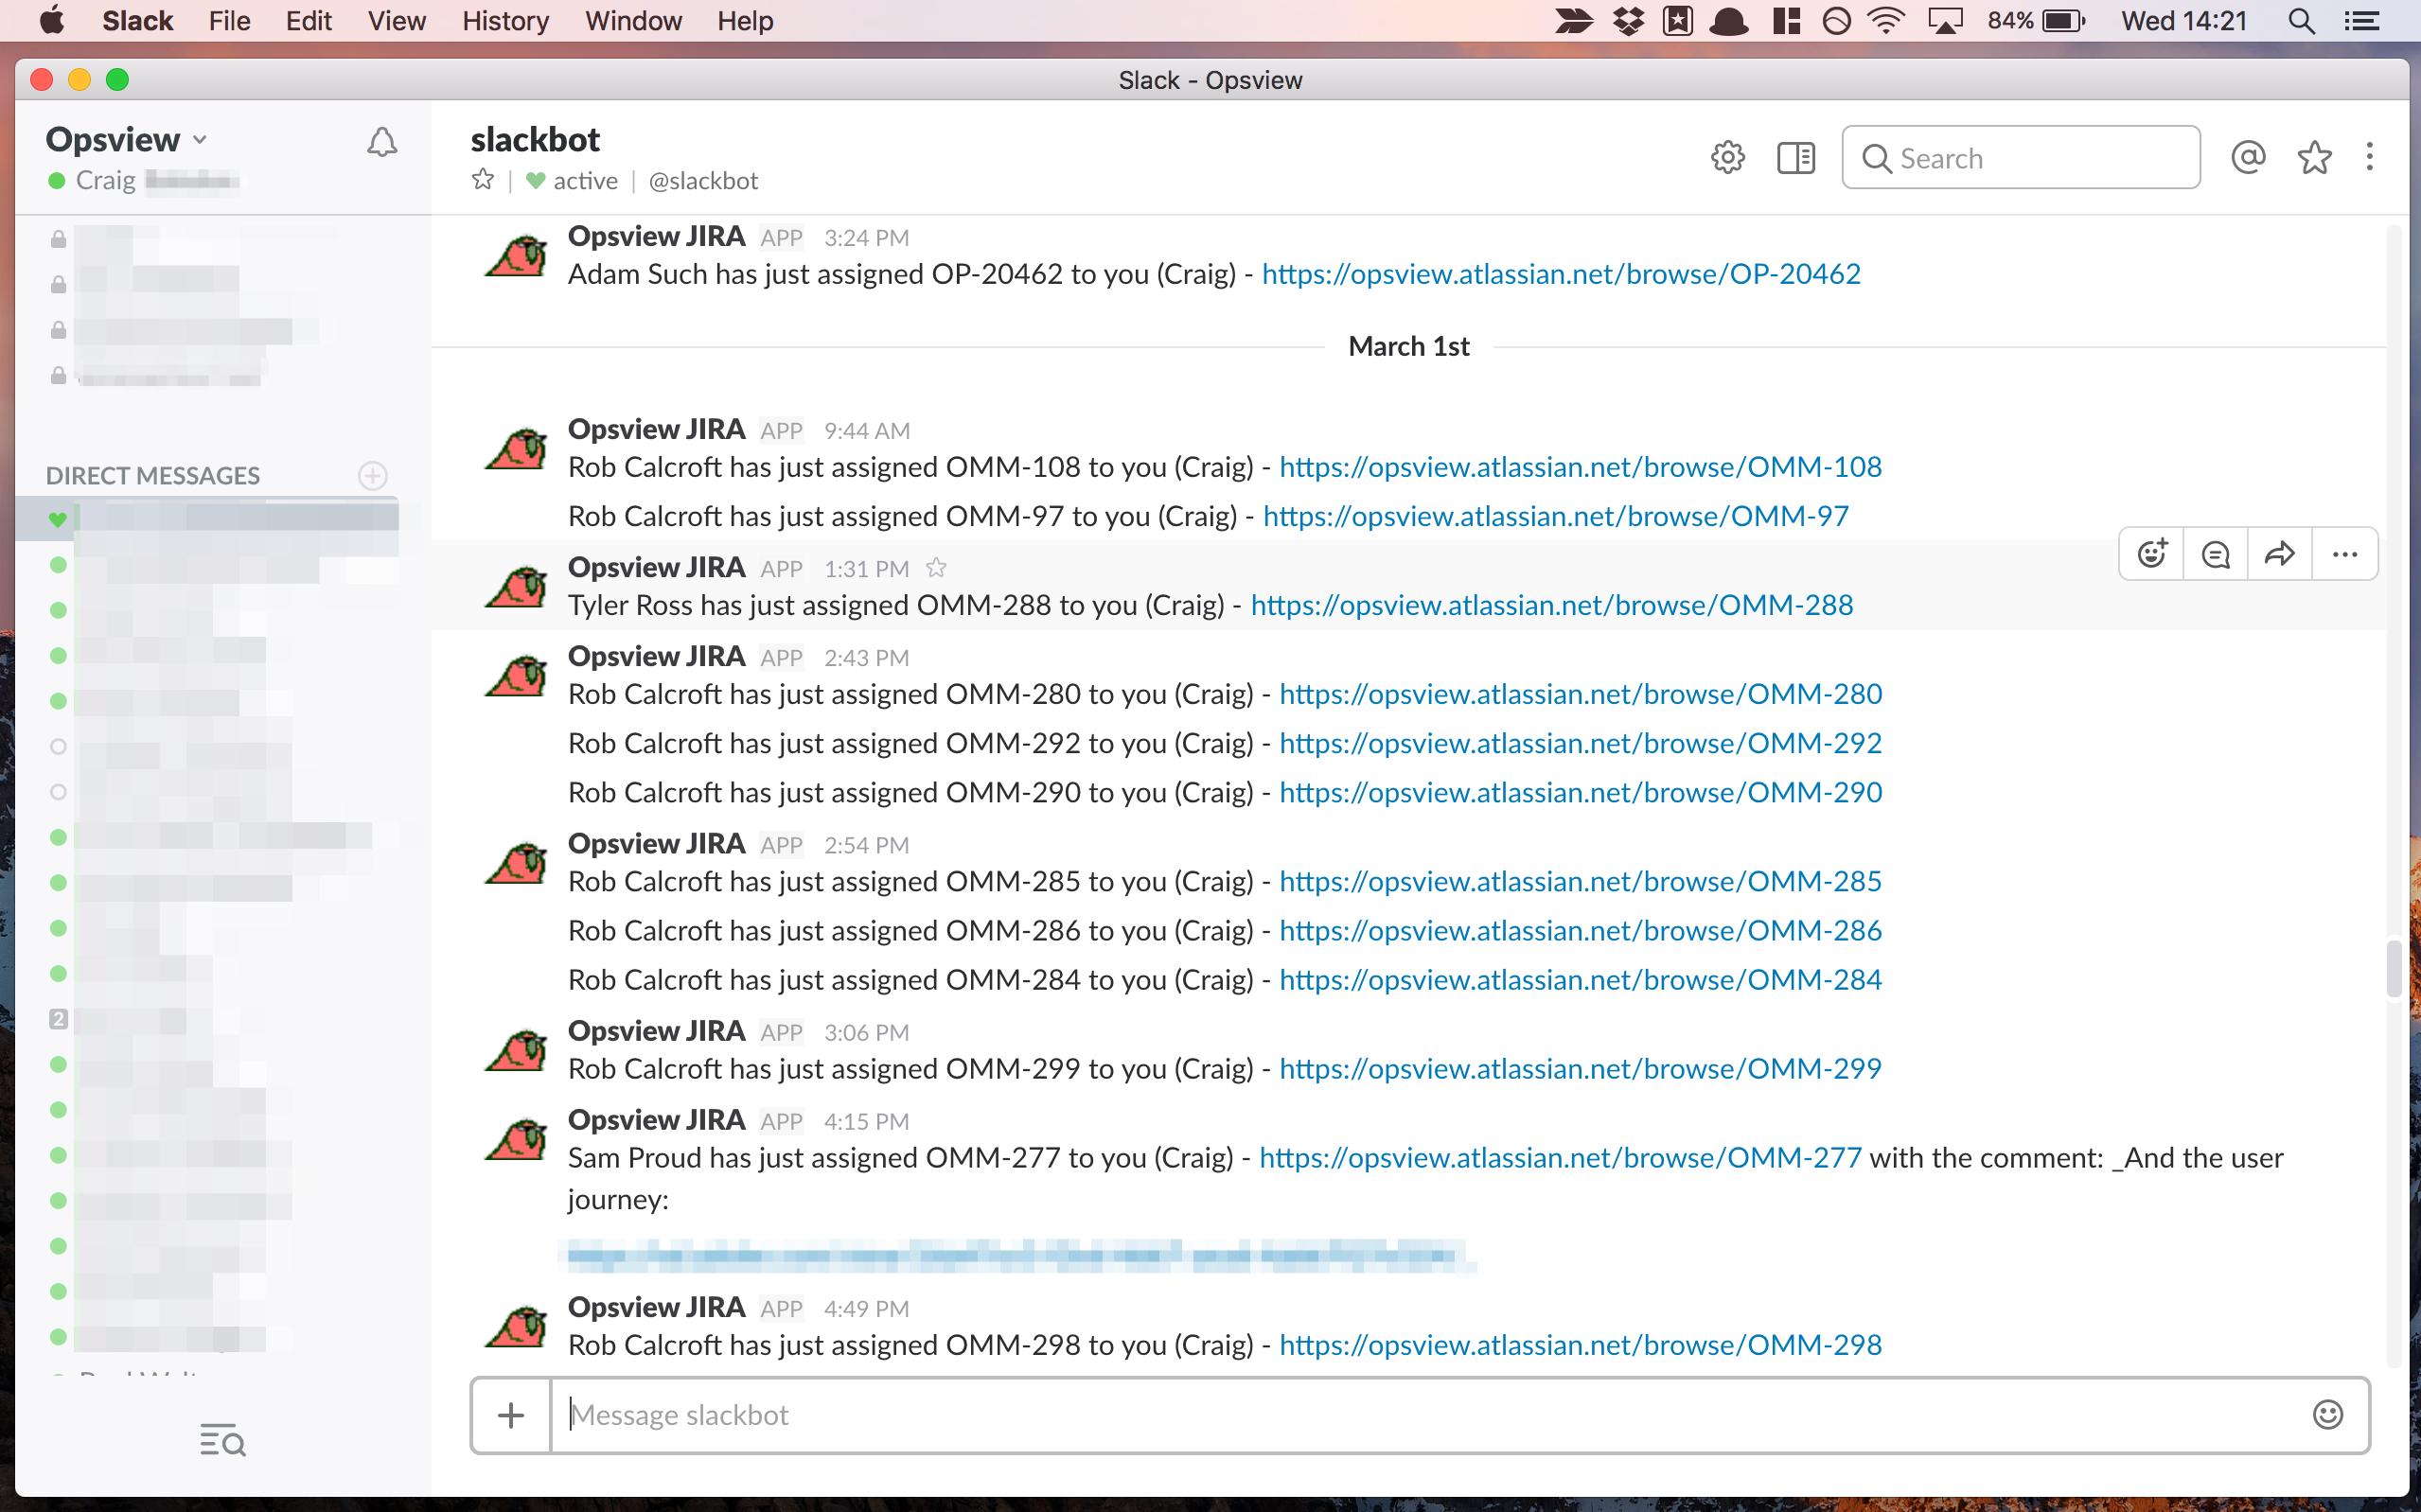 JIRA notifications via Slack